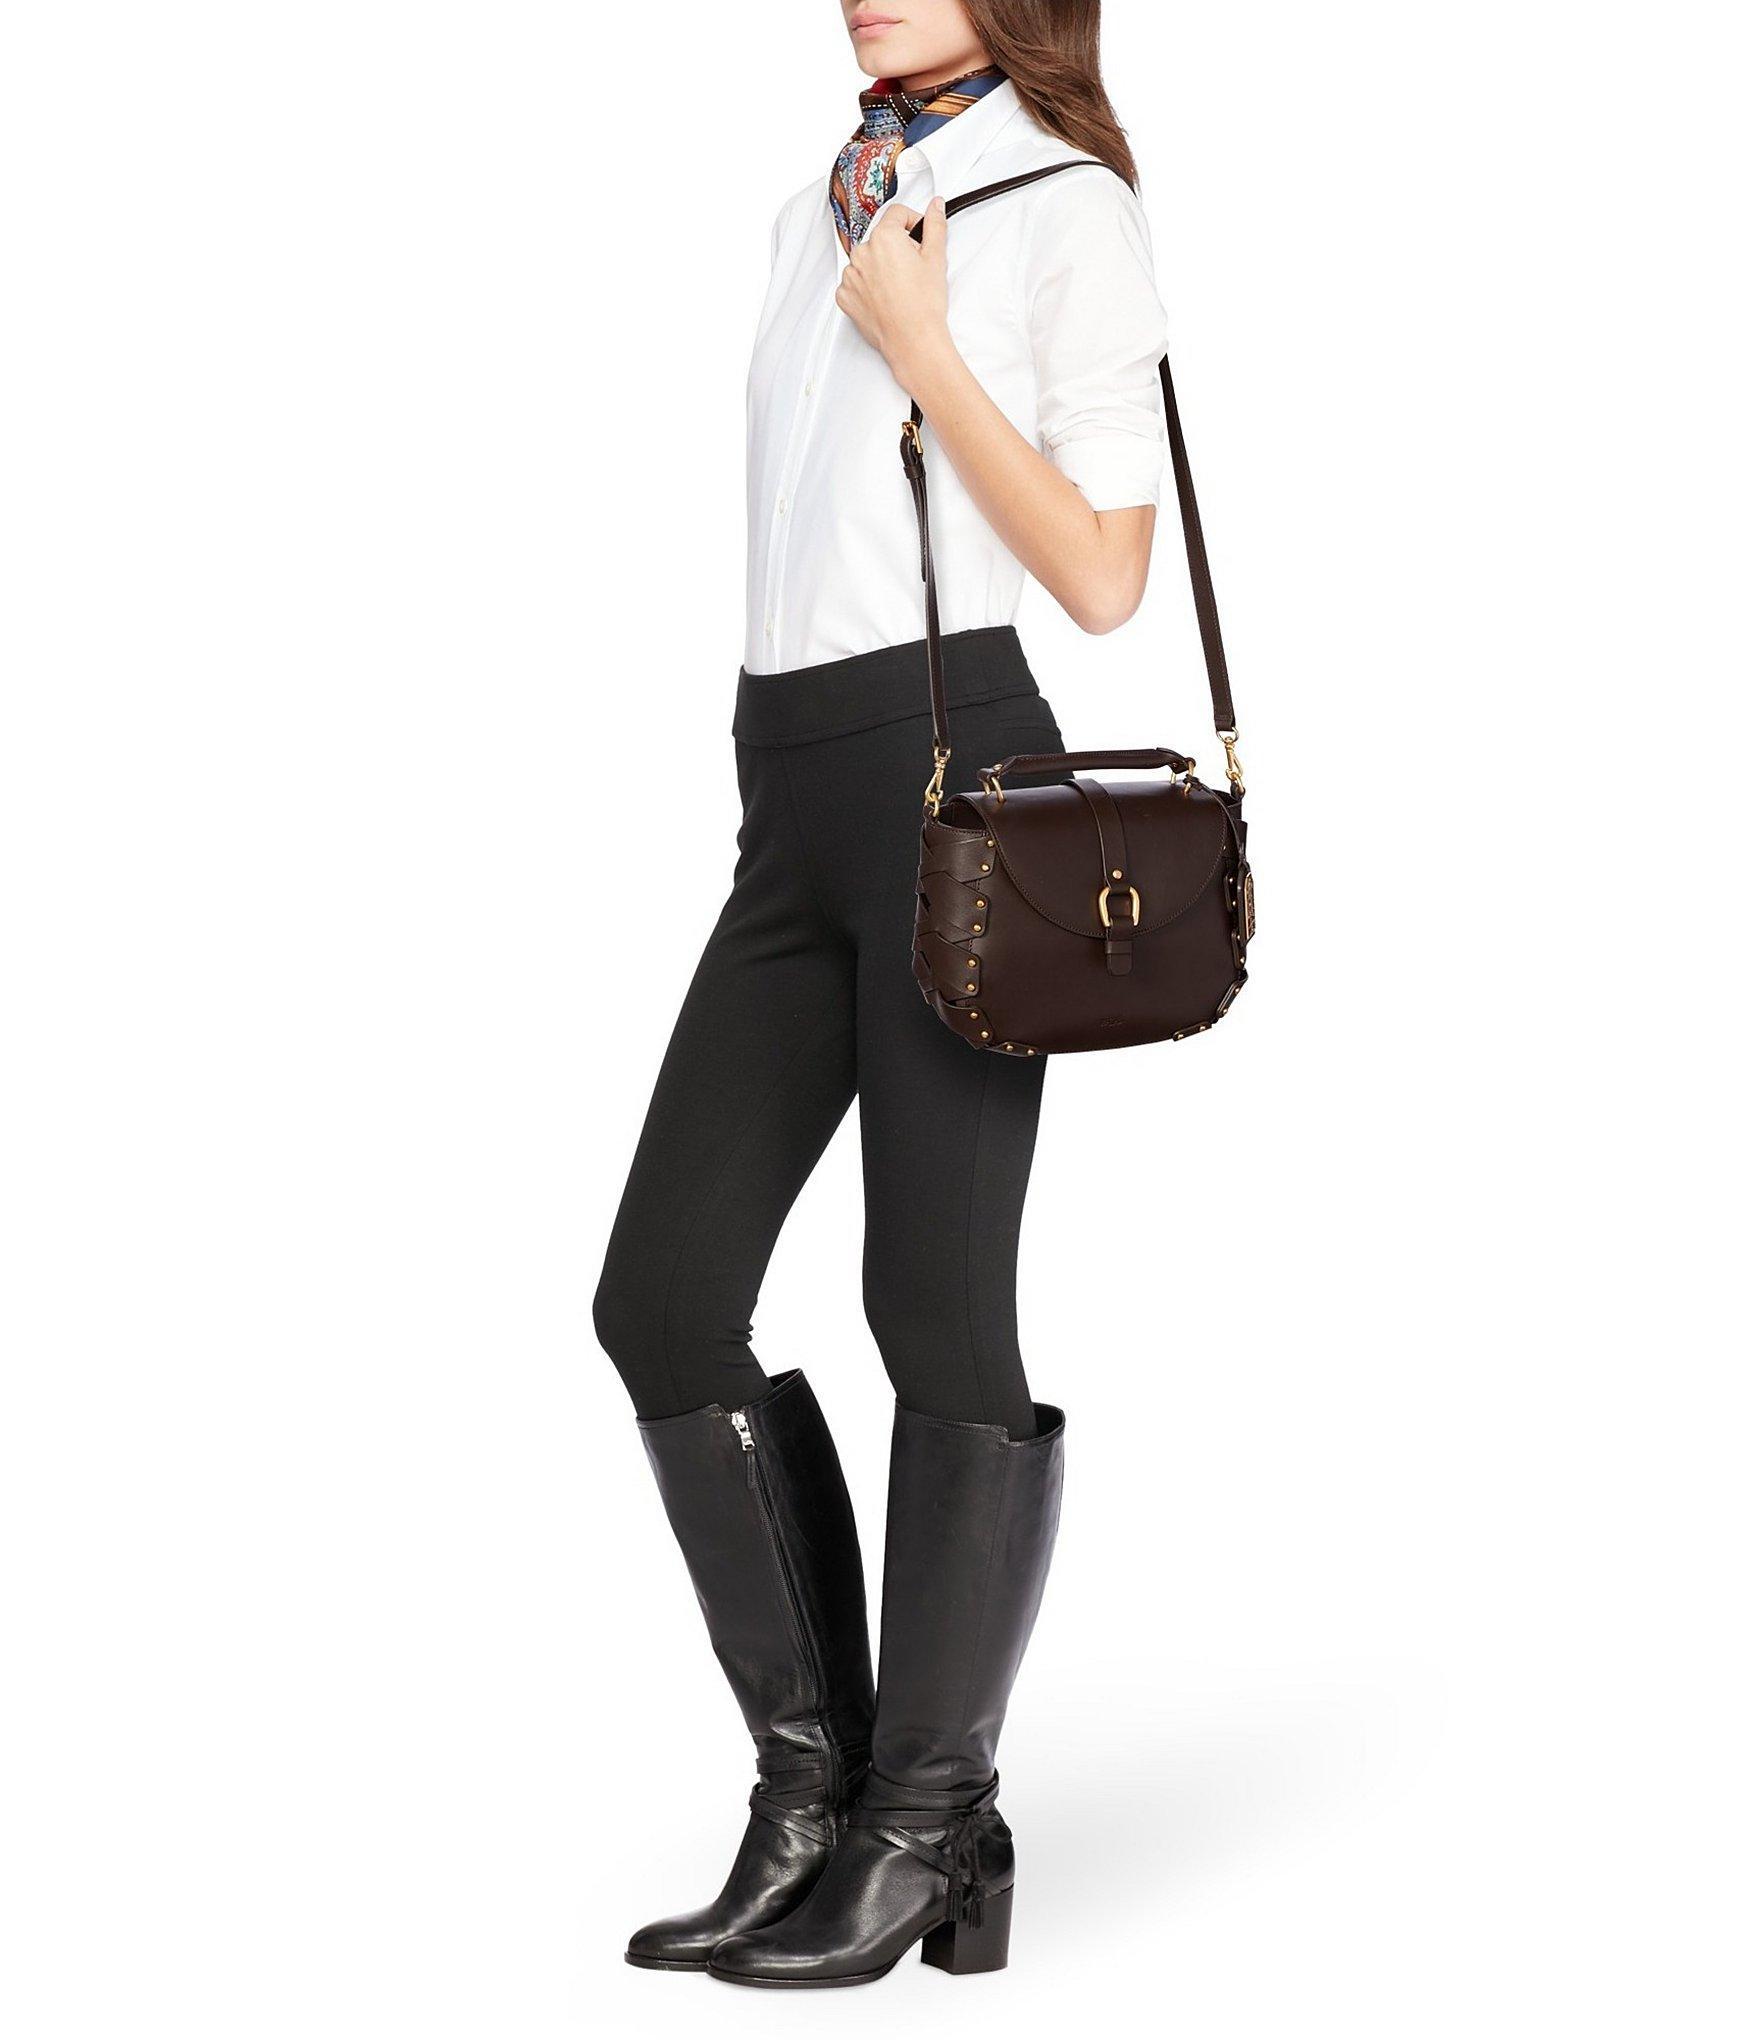 6075c86bbc92 Lyst - Lauren by Ralph Lauren Ludwick Collection Viana Saddle Bag in ...